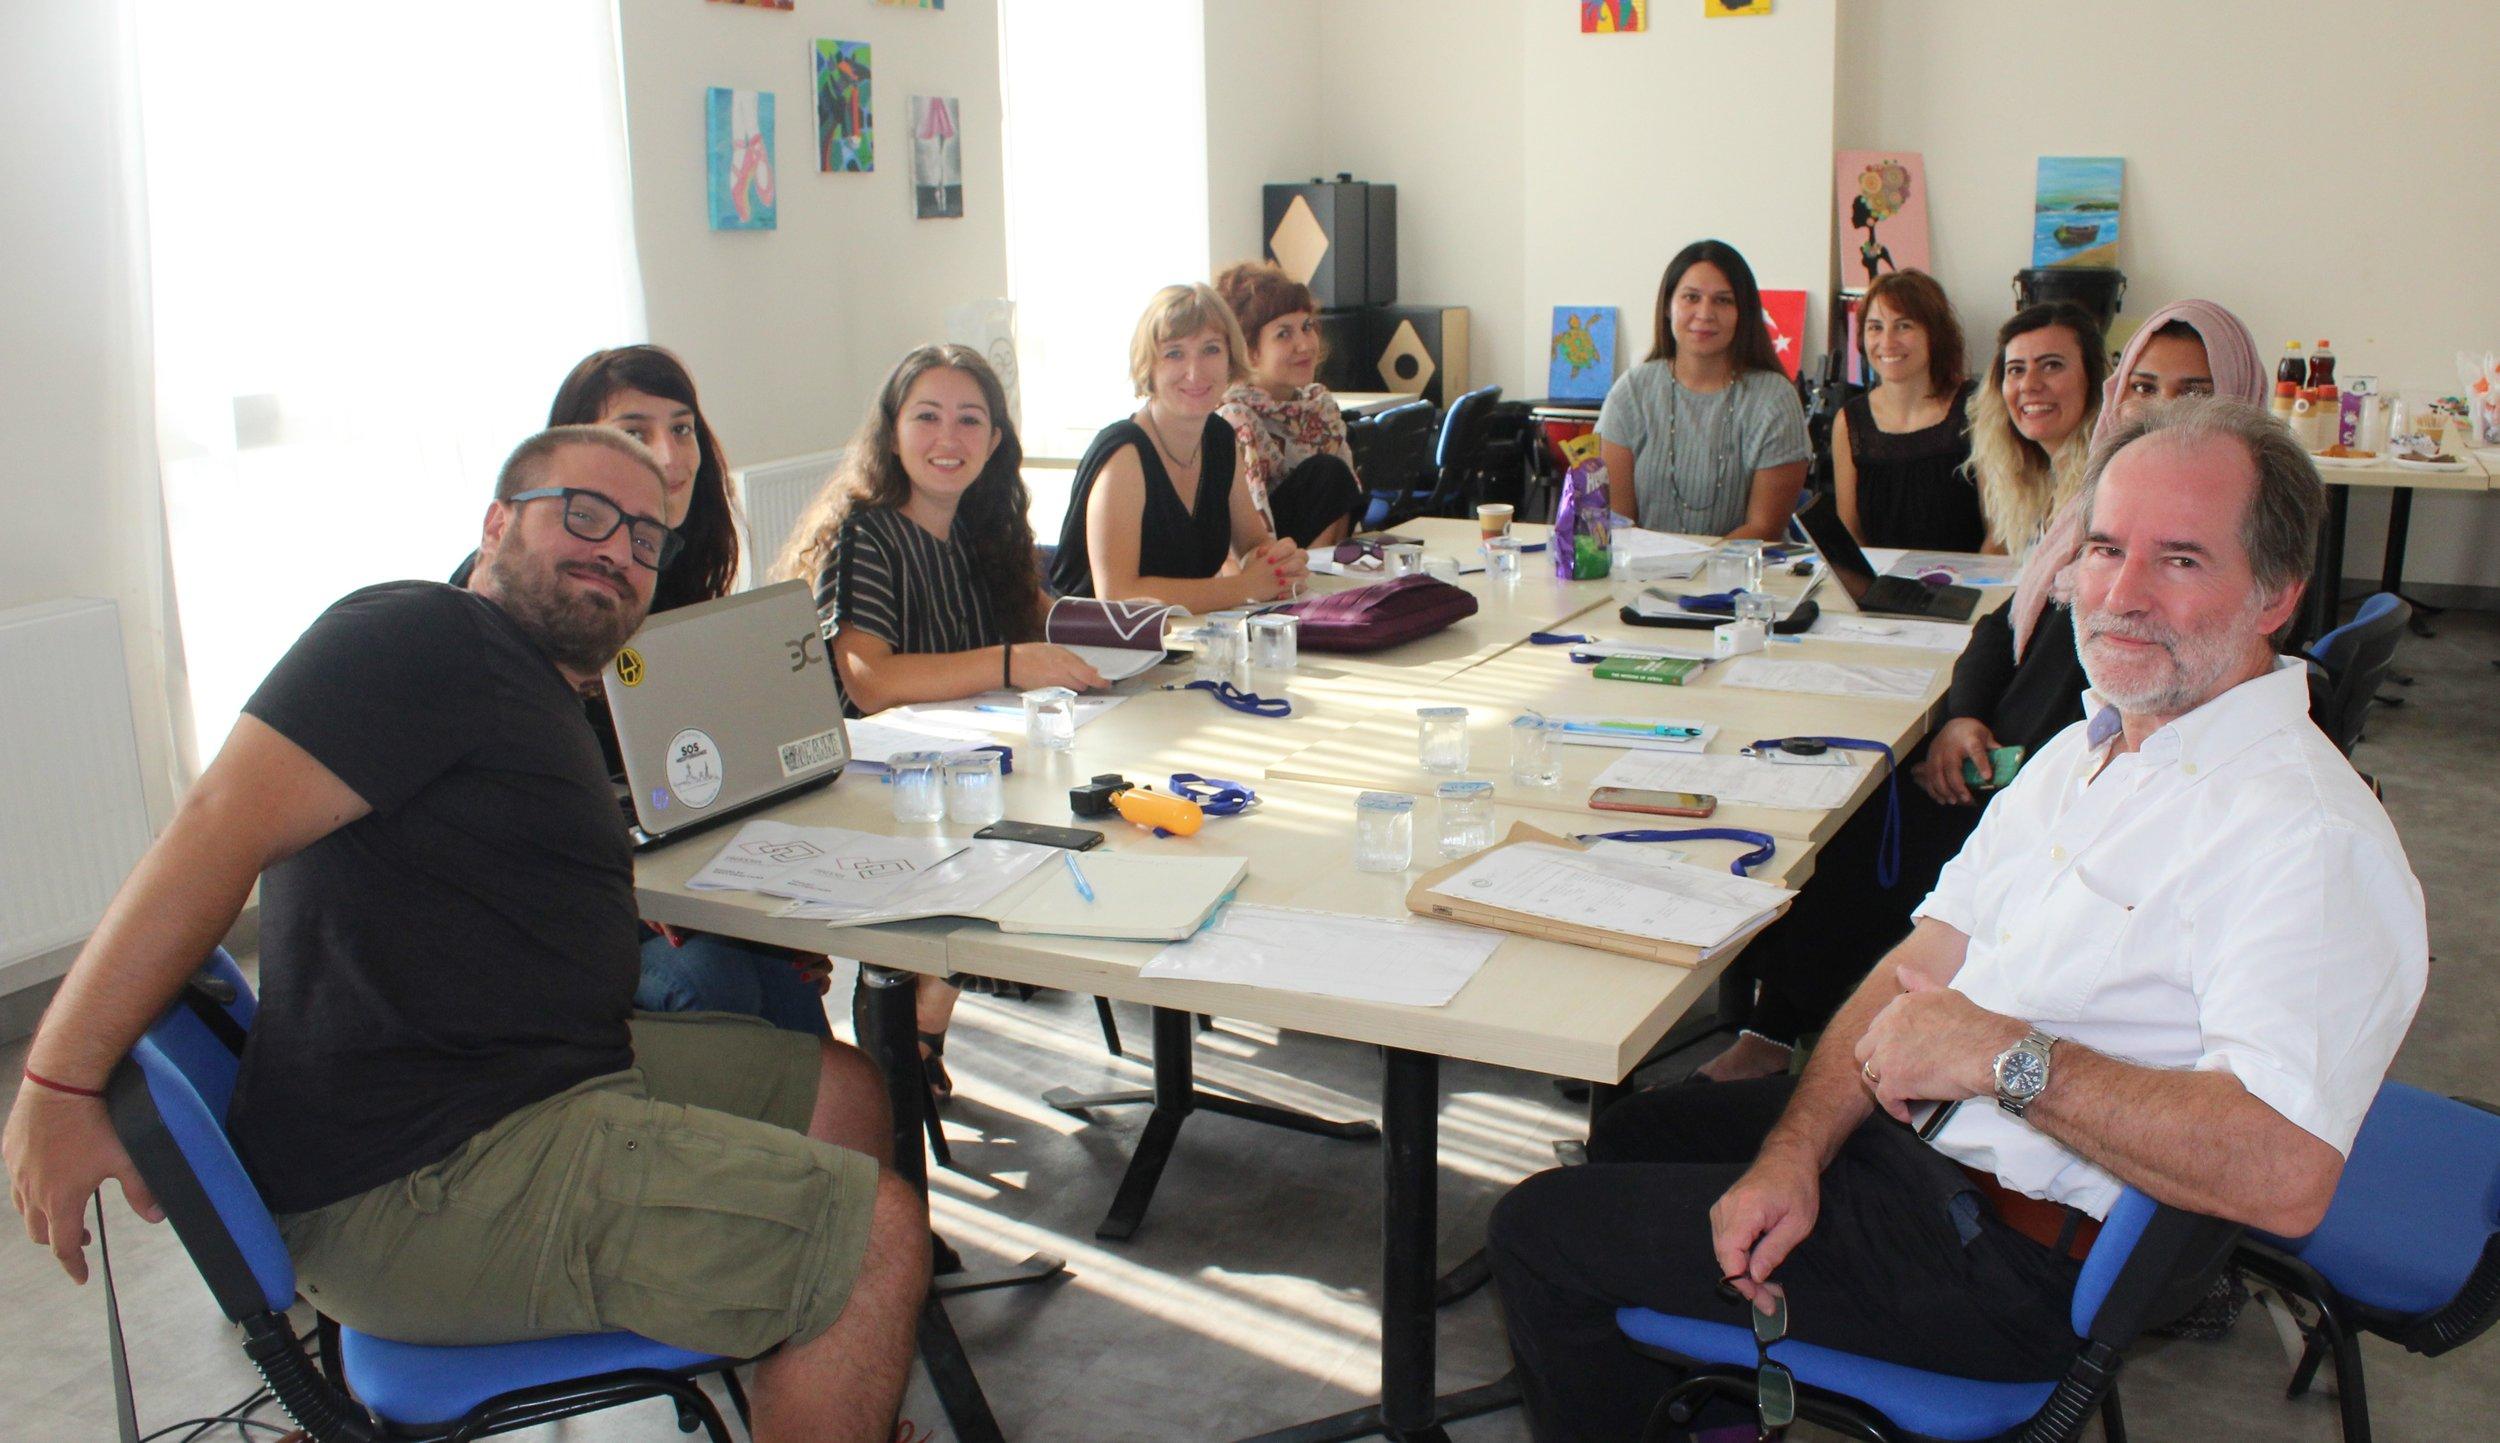 Group photo Day 1.jpg